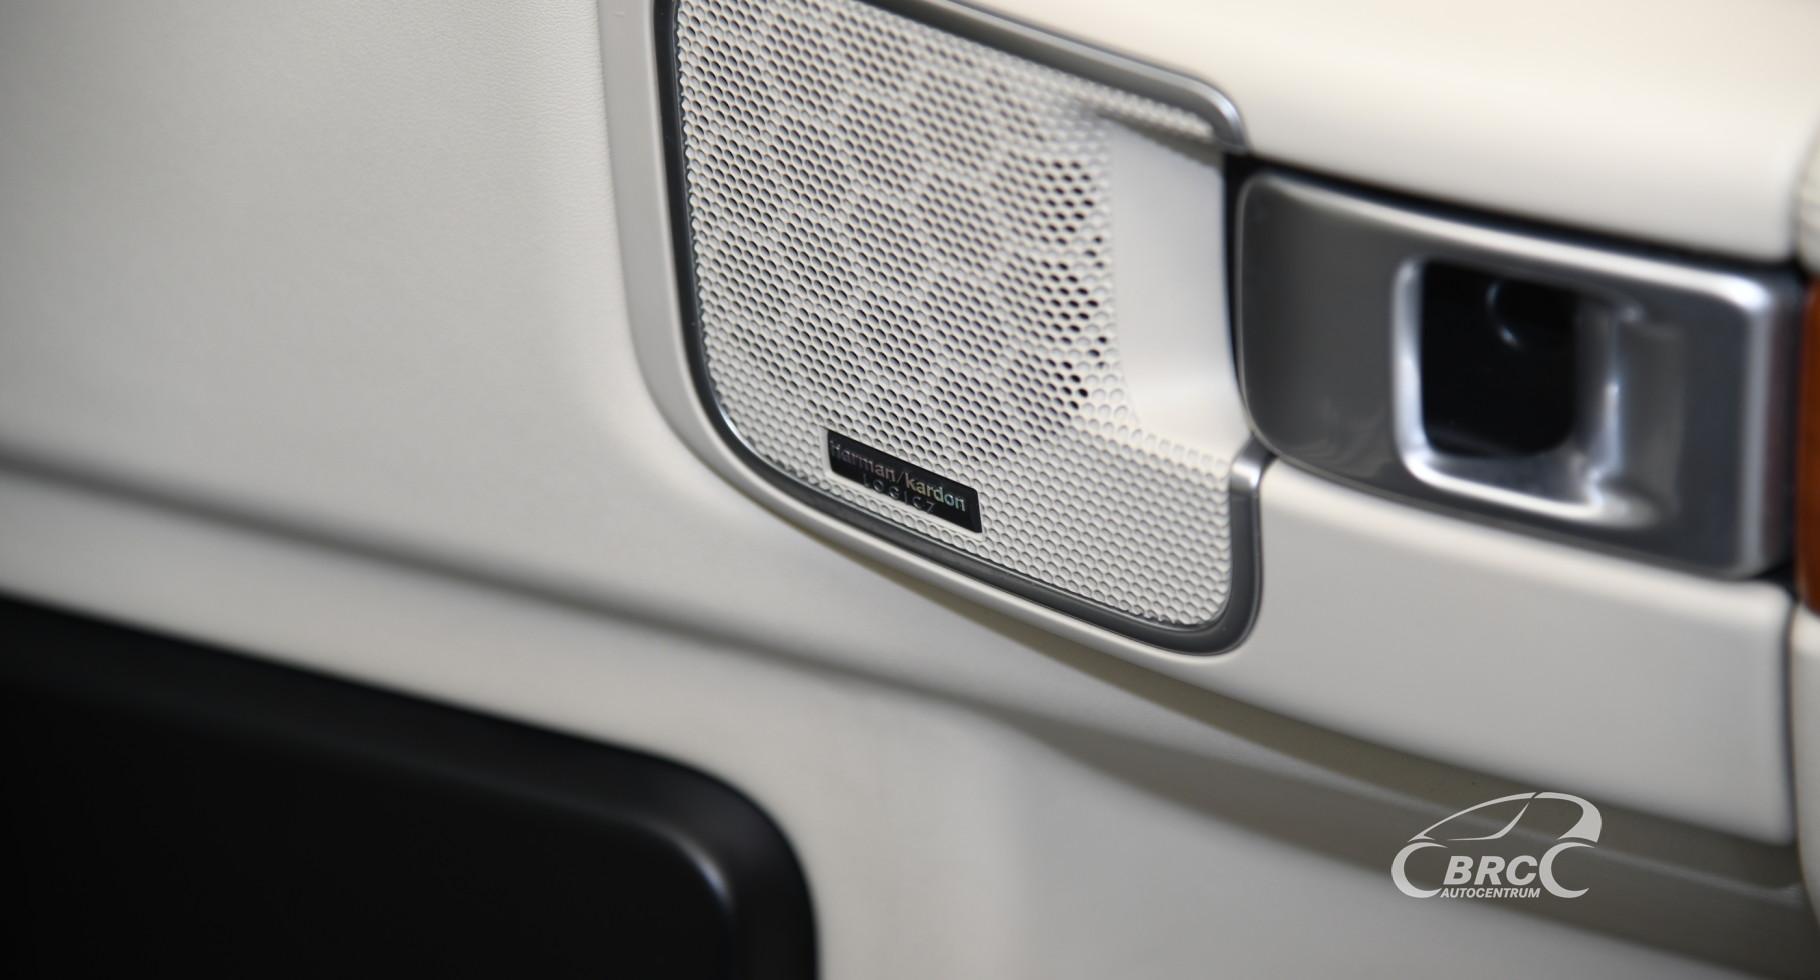 Land-Rover Range Rover TDV8 Vogue